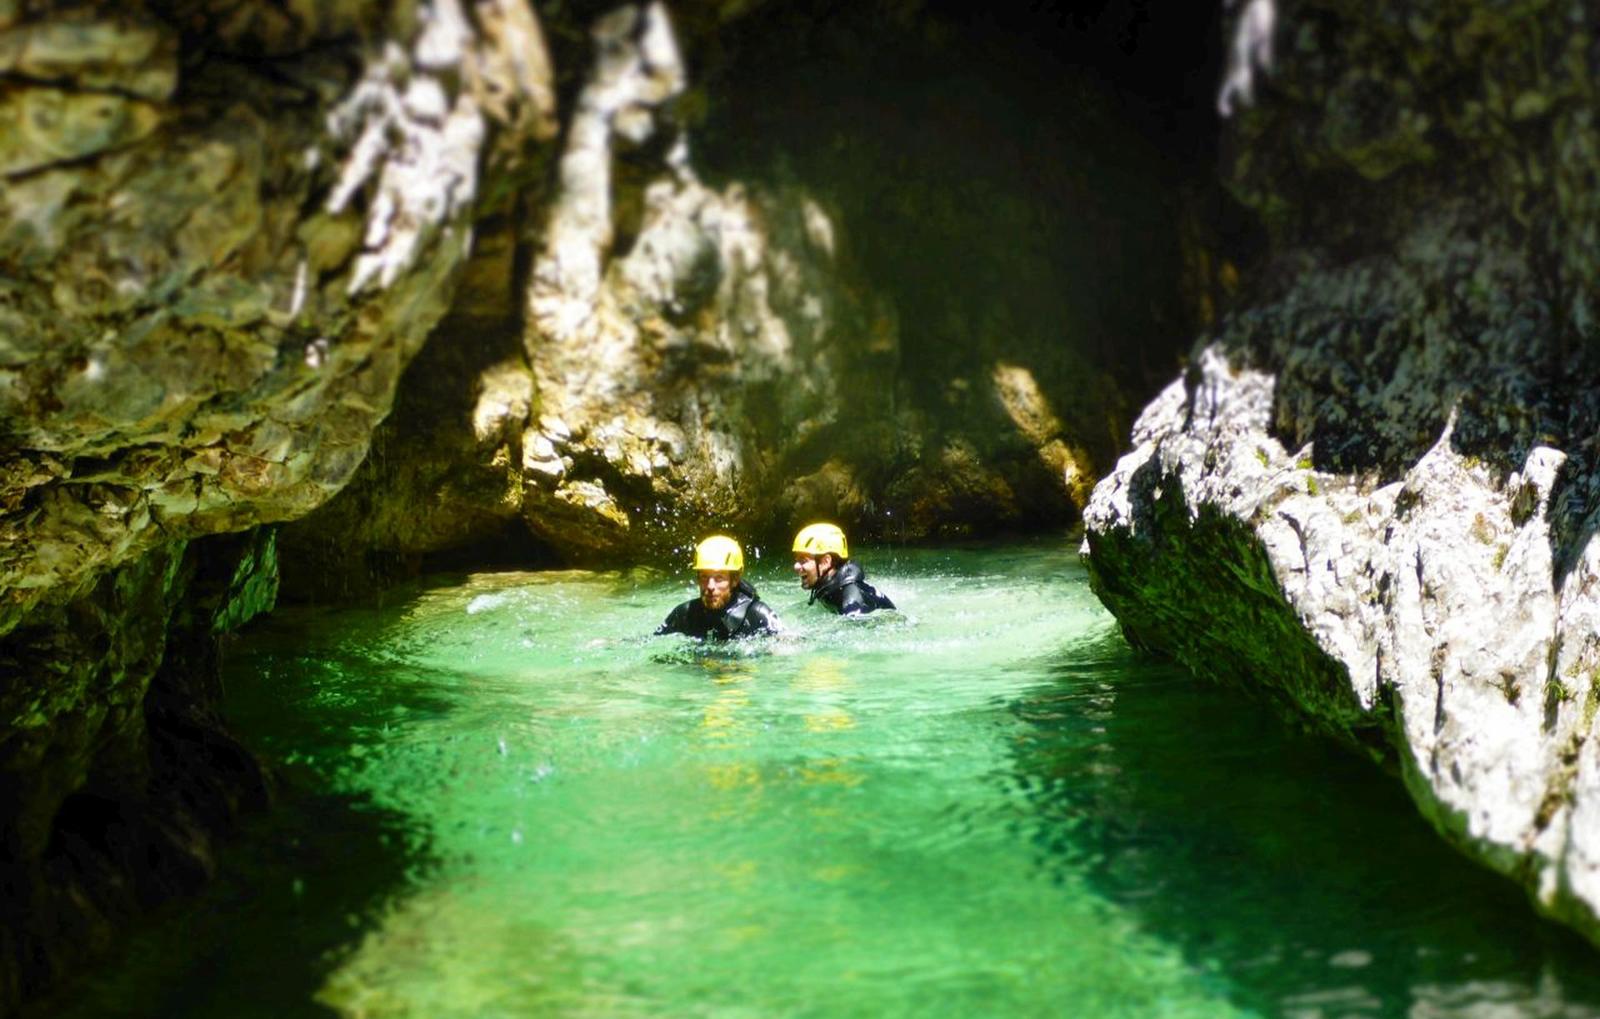 canyoning-tour-schneizlreuth-bg3